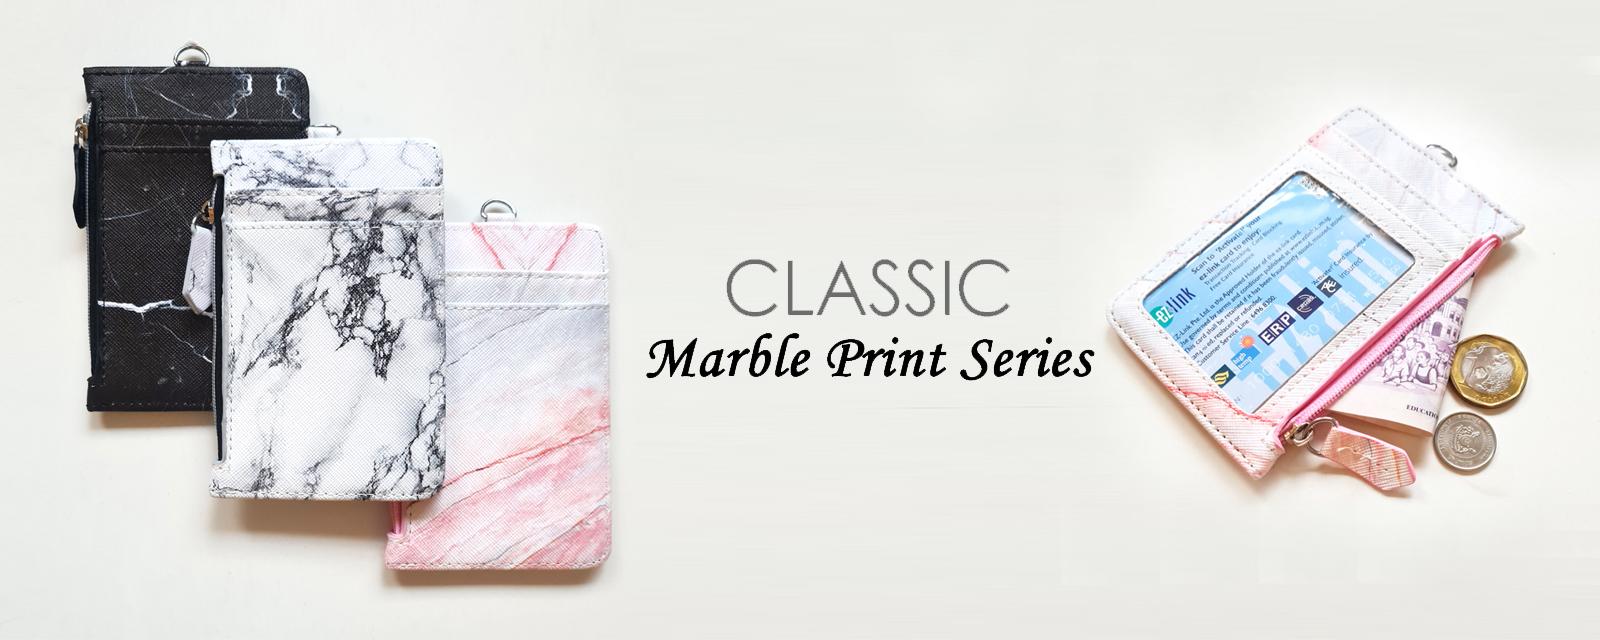 New Marble Print Zip cardholder